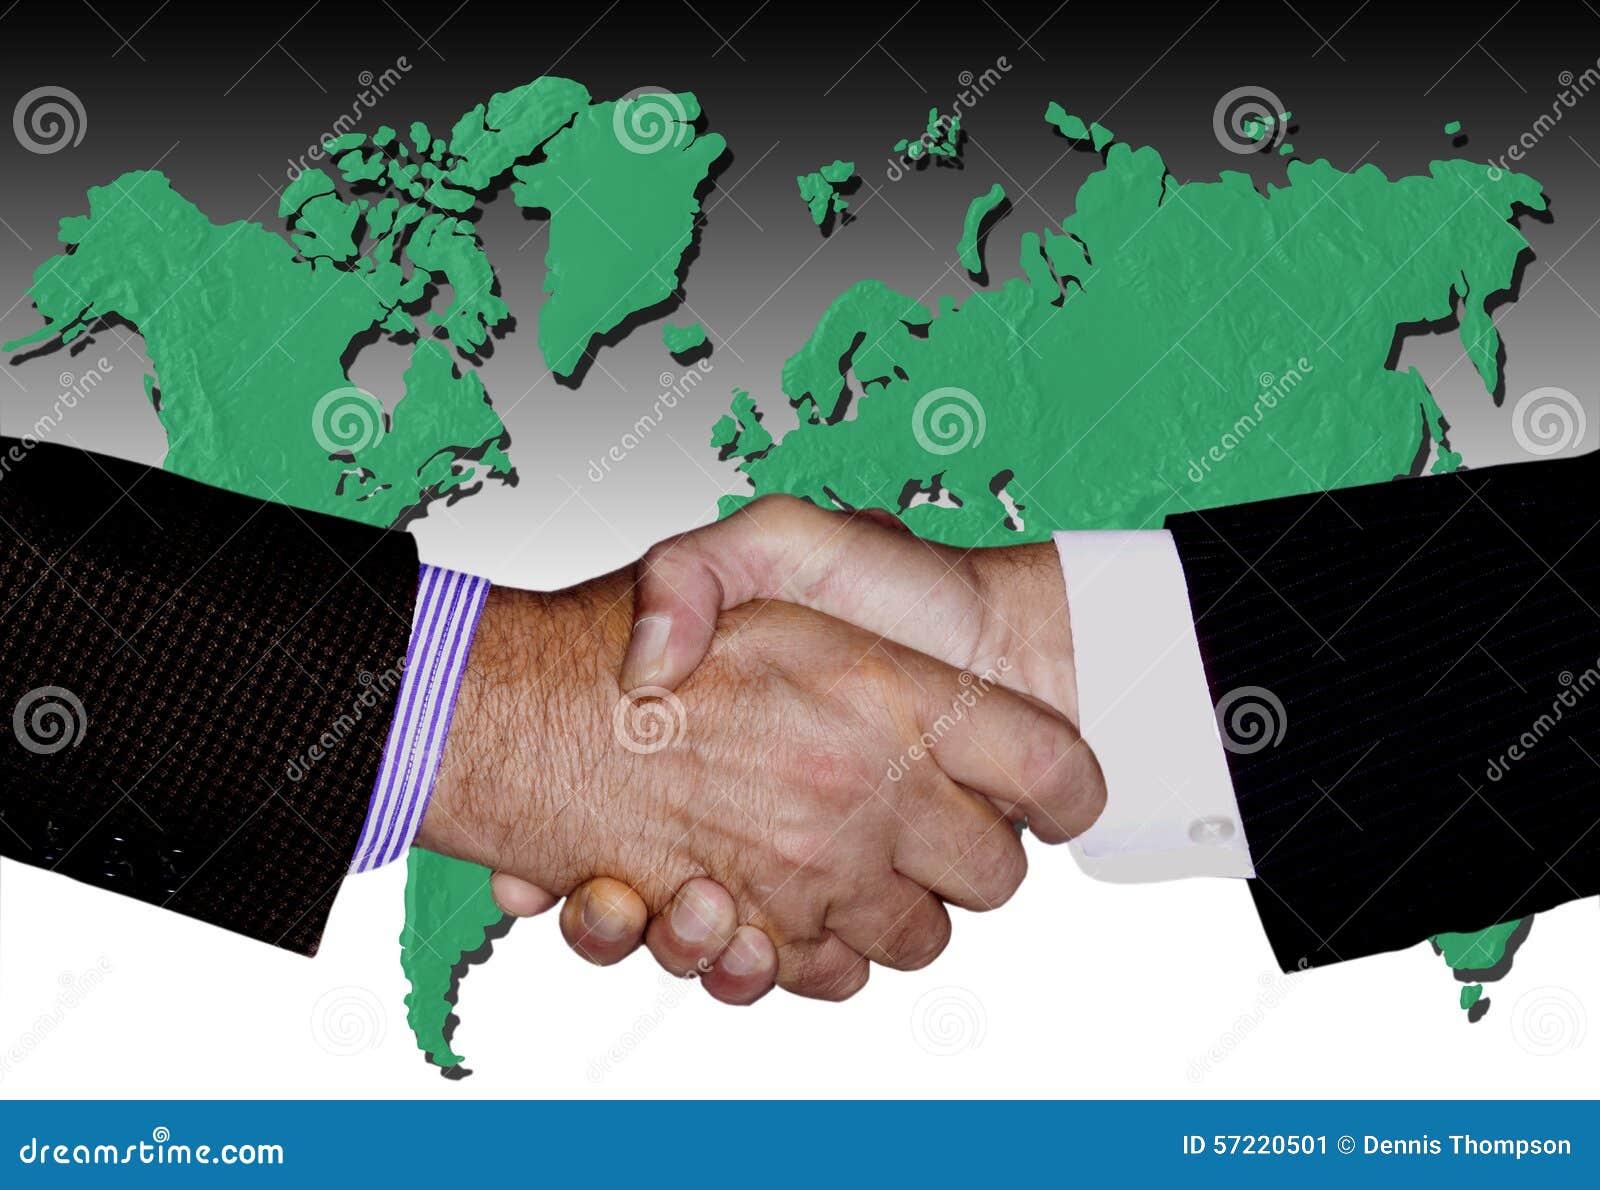 HANDSHAKE ENVIRONMENTAL GLOBAL TECHNOLOGY BUSINESS INDUSTRY